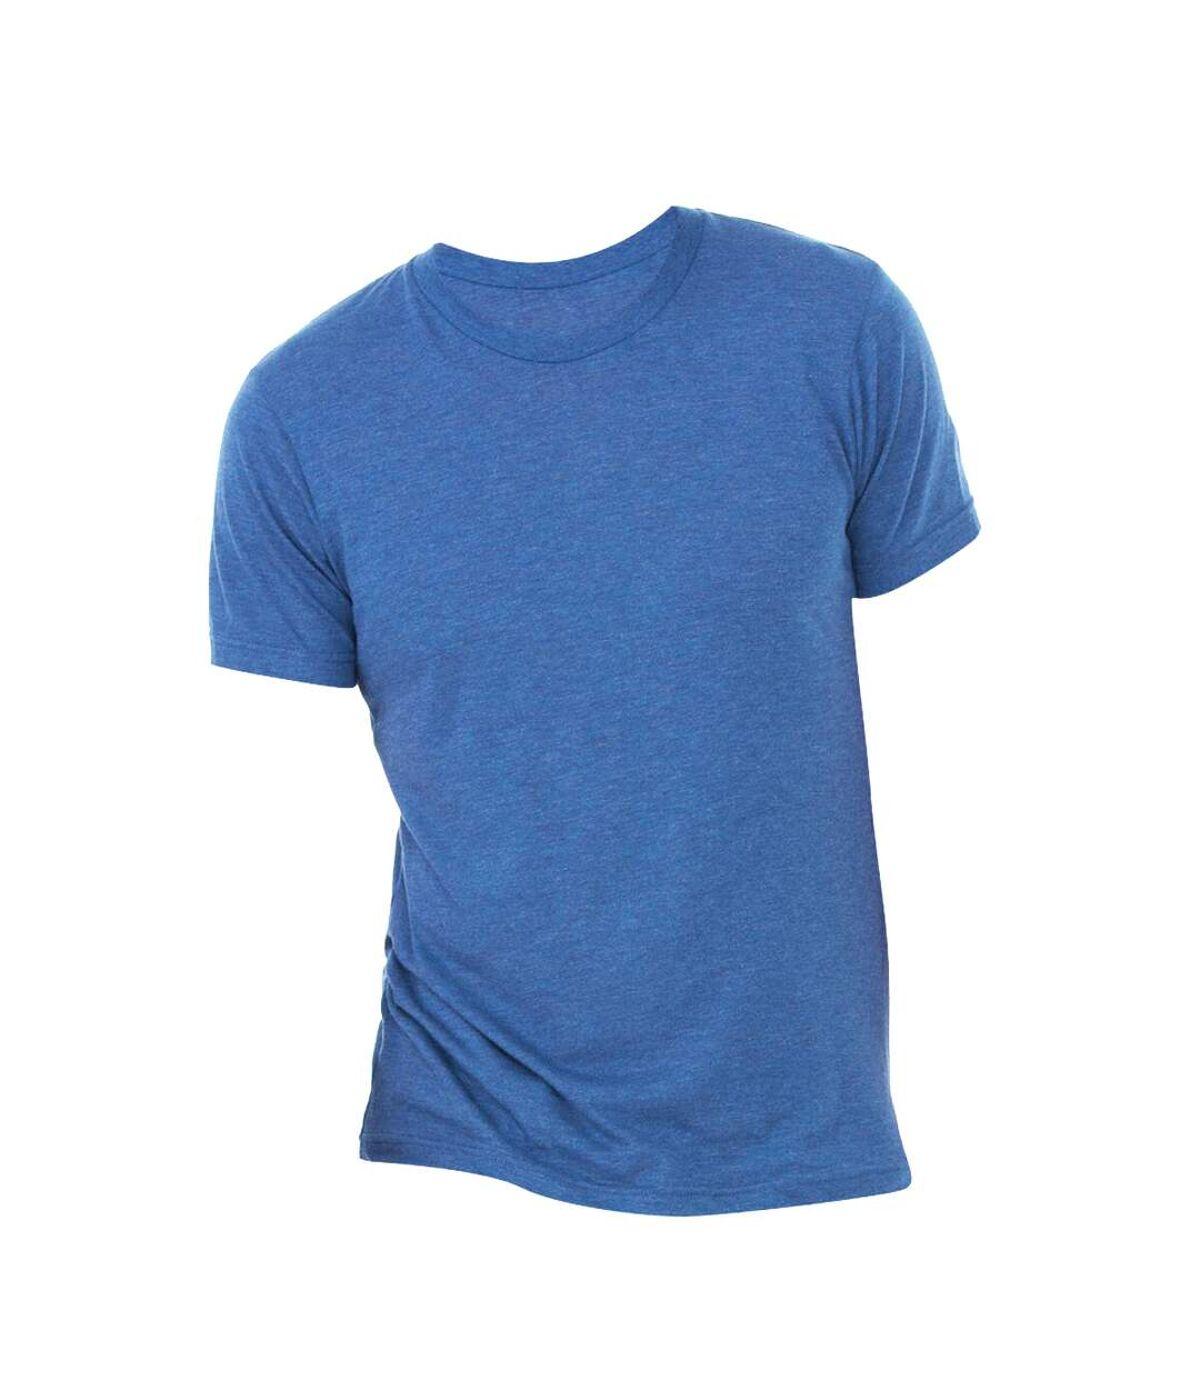 Canvas Mens Triblend Crew Neck Plain Short Sleeve T-Shirt (True Royal Triblend) - UTBC2596